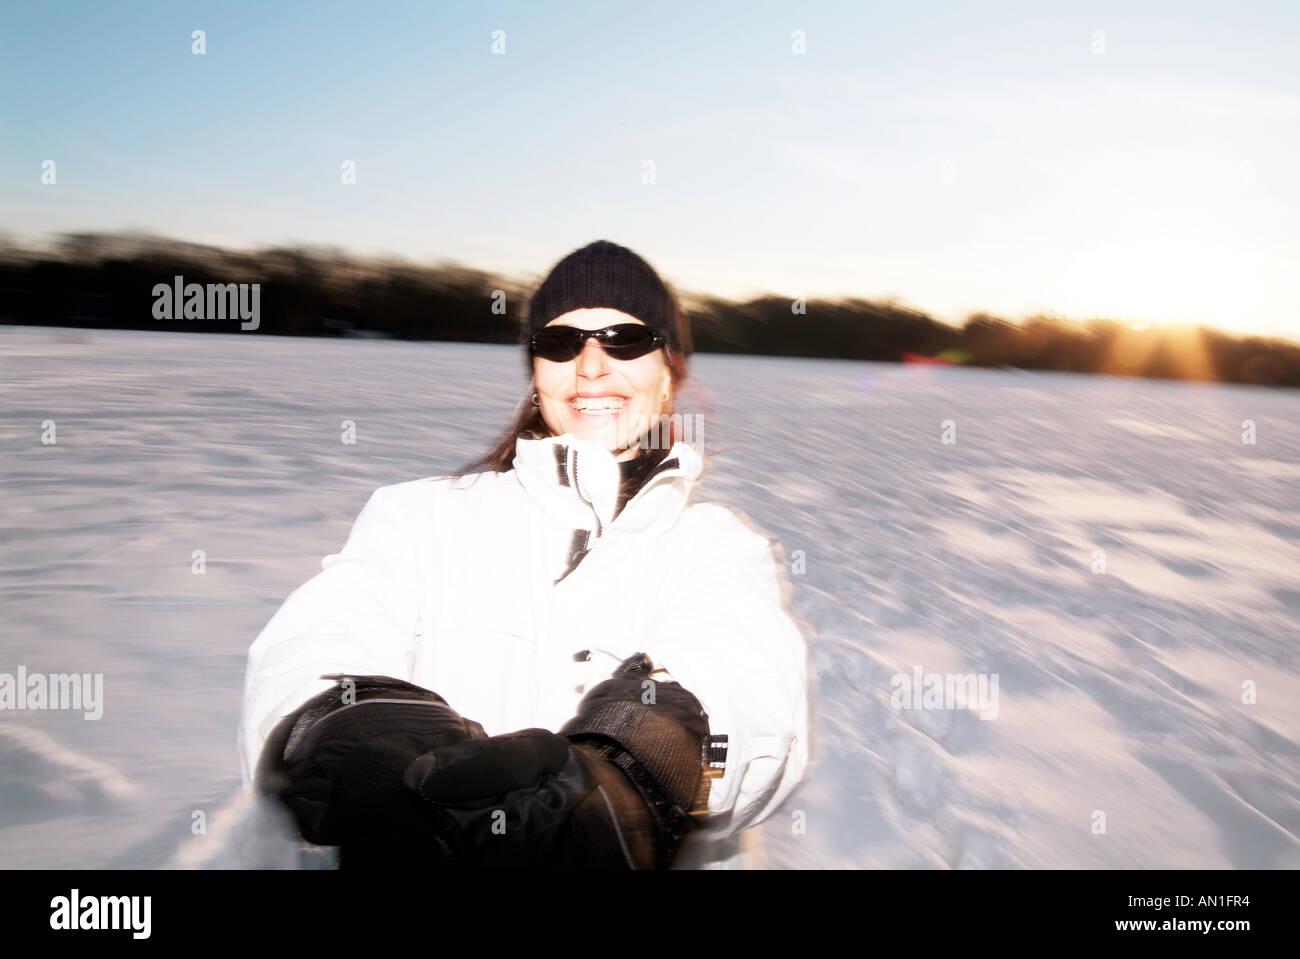 young woman enjoying snow in hamburg - Germany, fun, snowy, Lifestyle - Stock Image